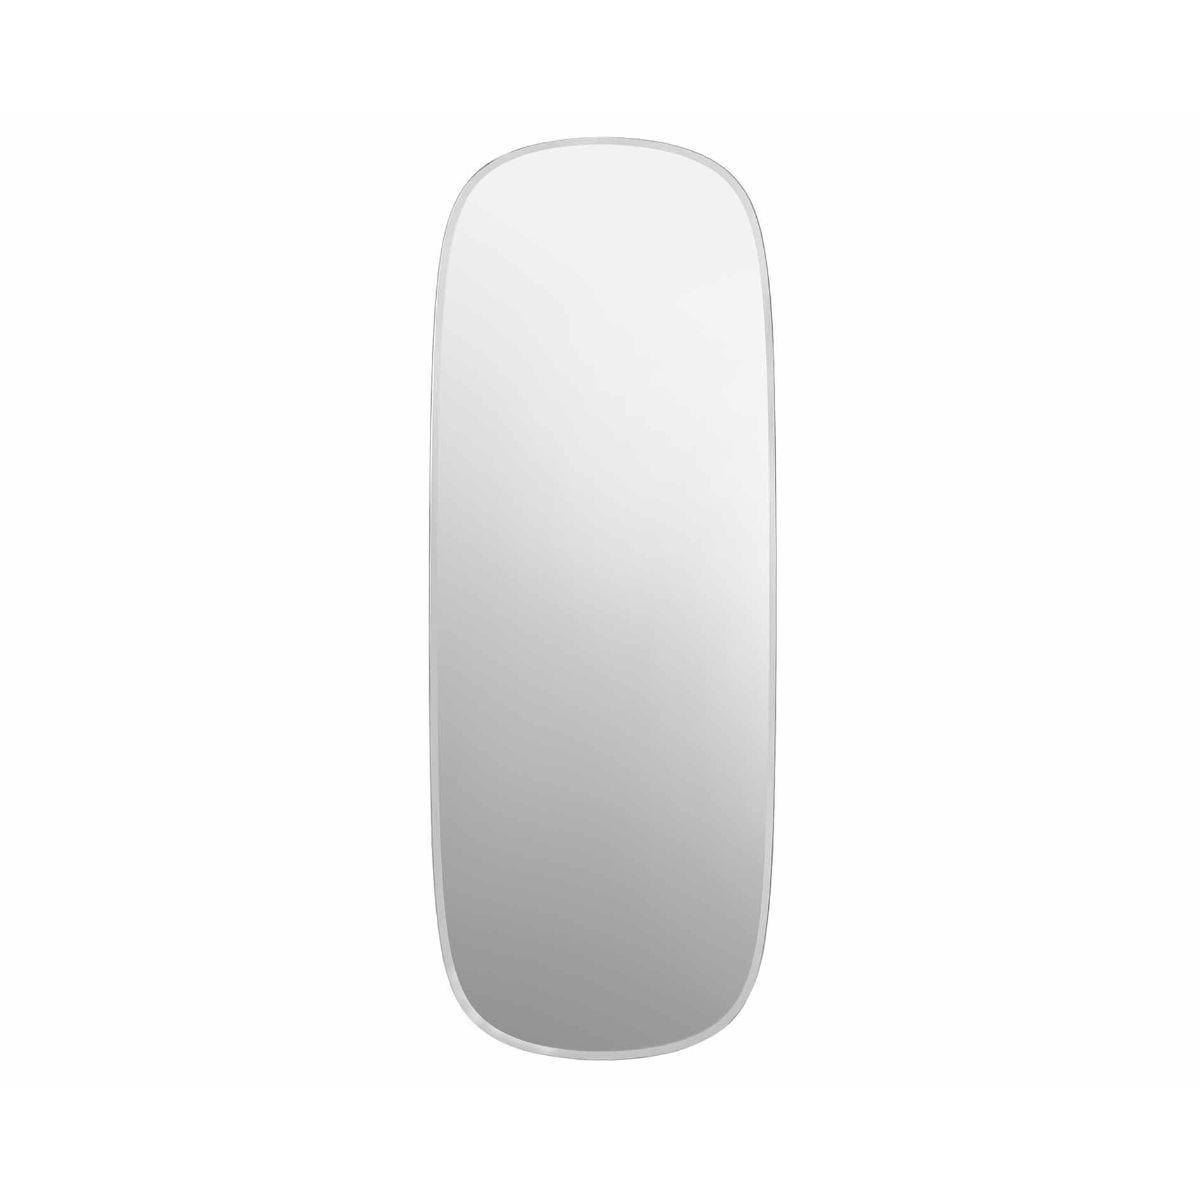 Innova Linnea Bevelled Frameless Wall Mirror 118cm x 45cm Silver